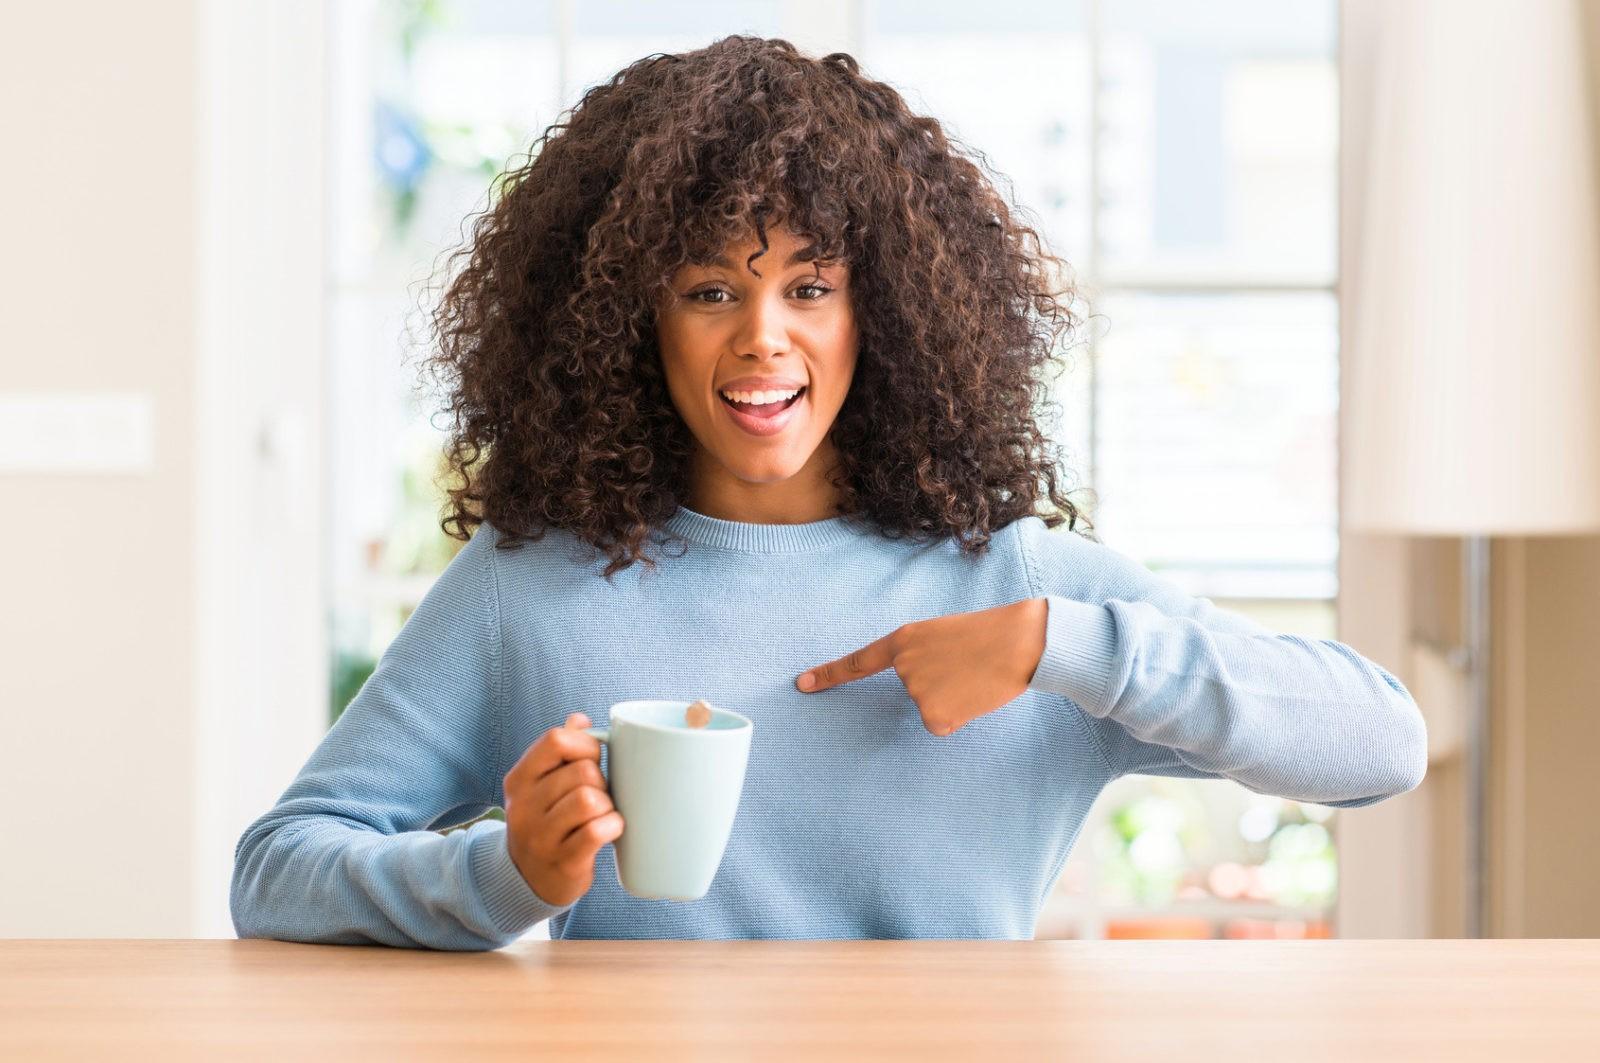 Koffein gegen Haarausfall?